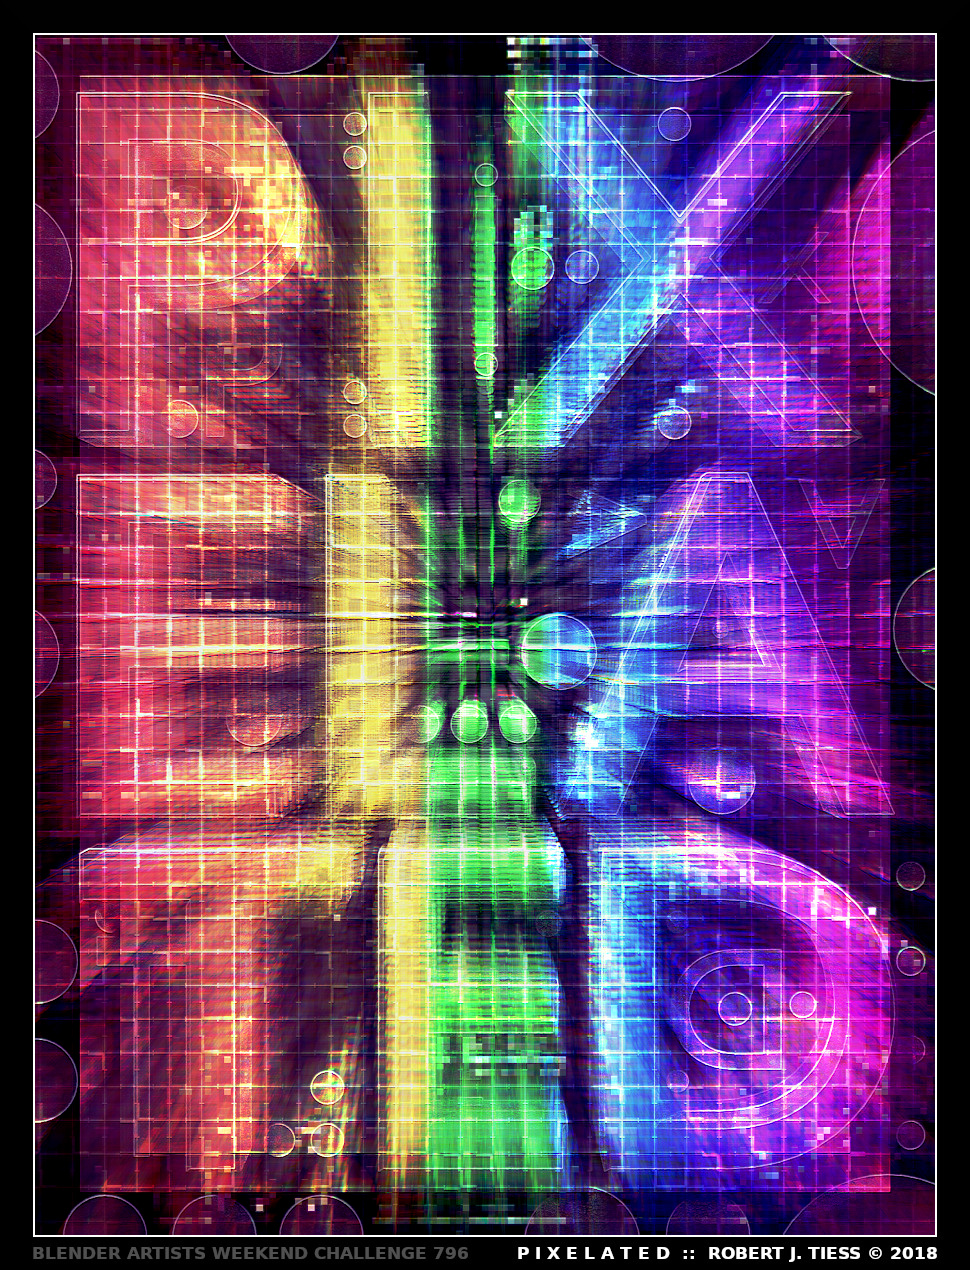 PIXELATED - By Robert J. Tiess